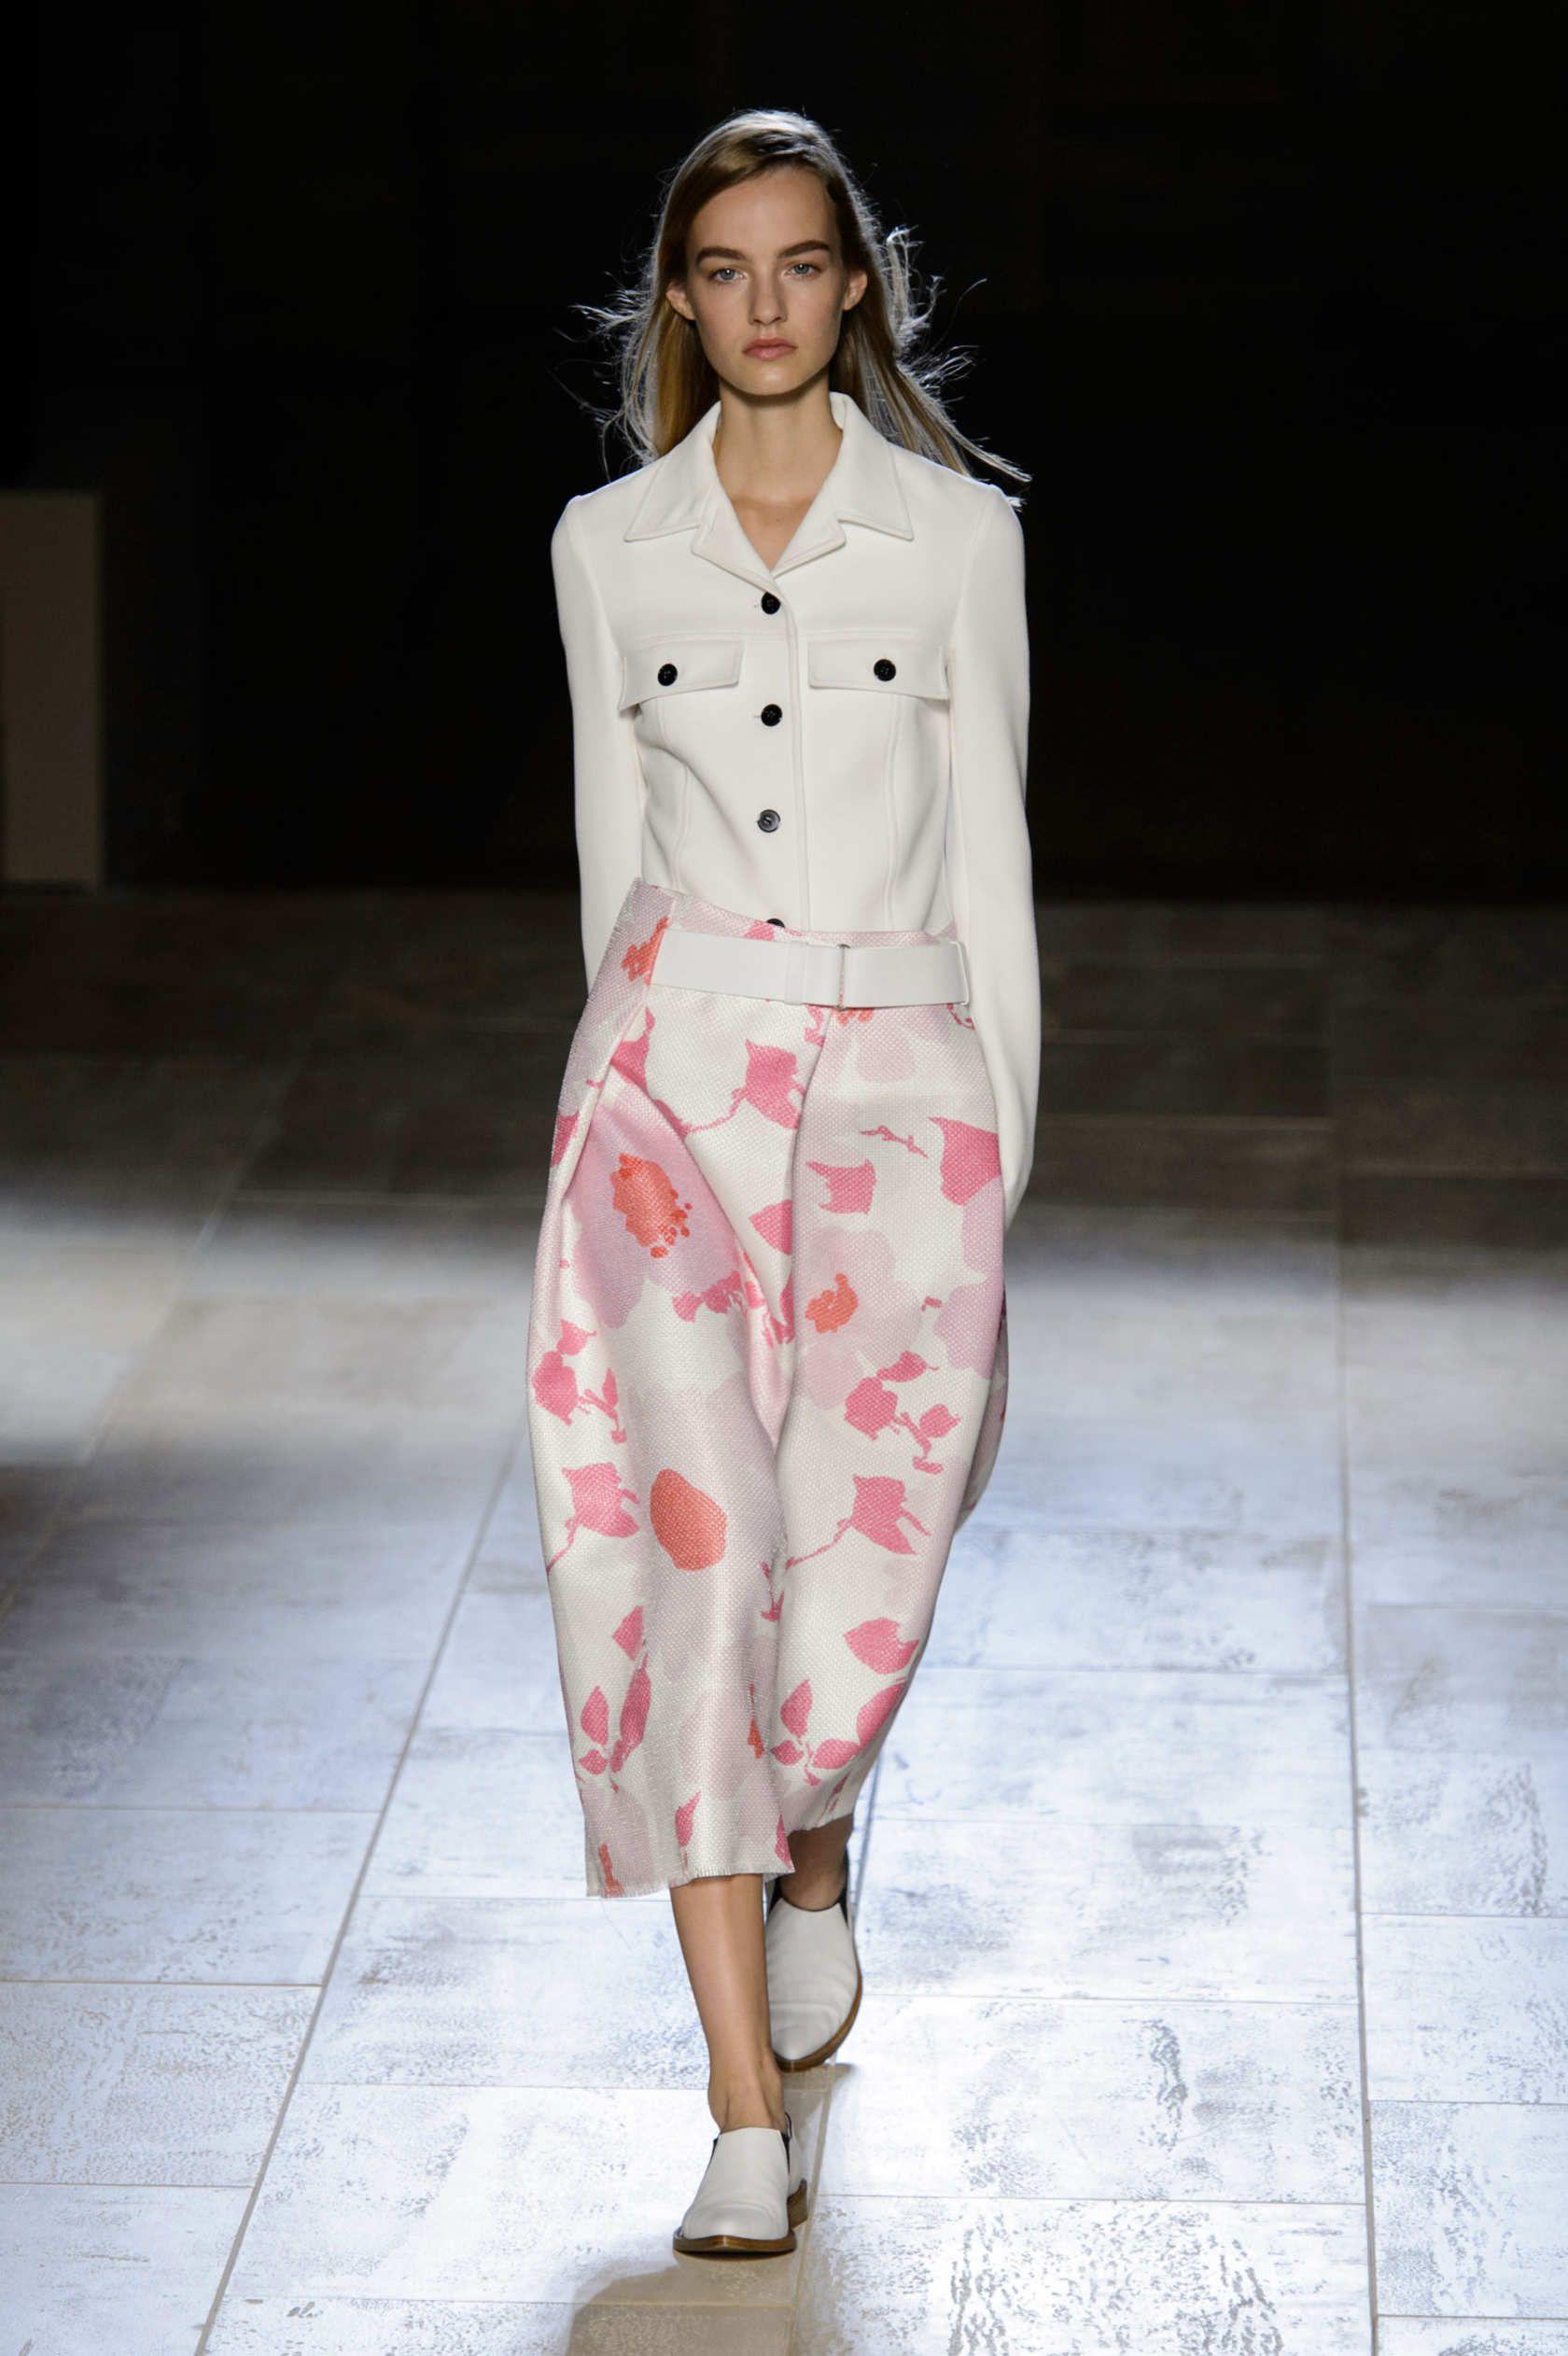 Victoria Beckham Ny fashion week, Runway fashion